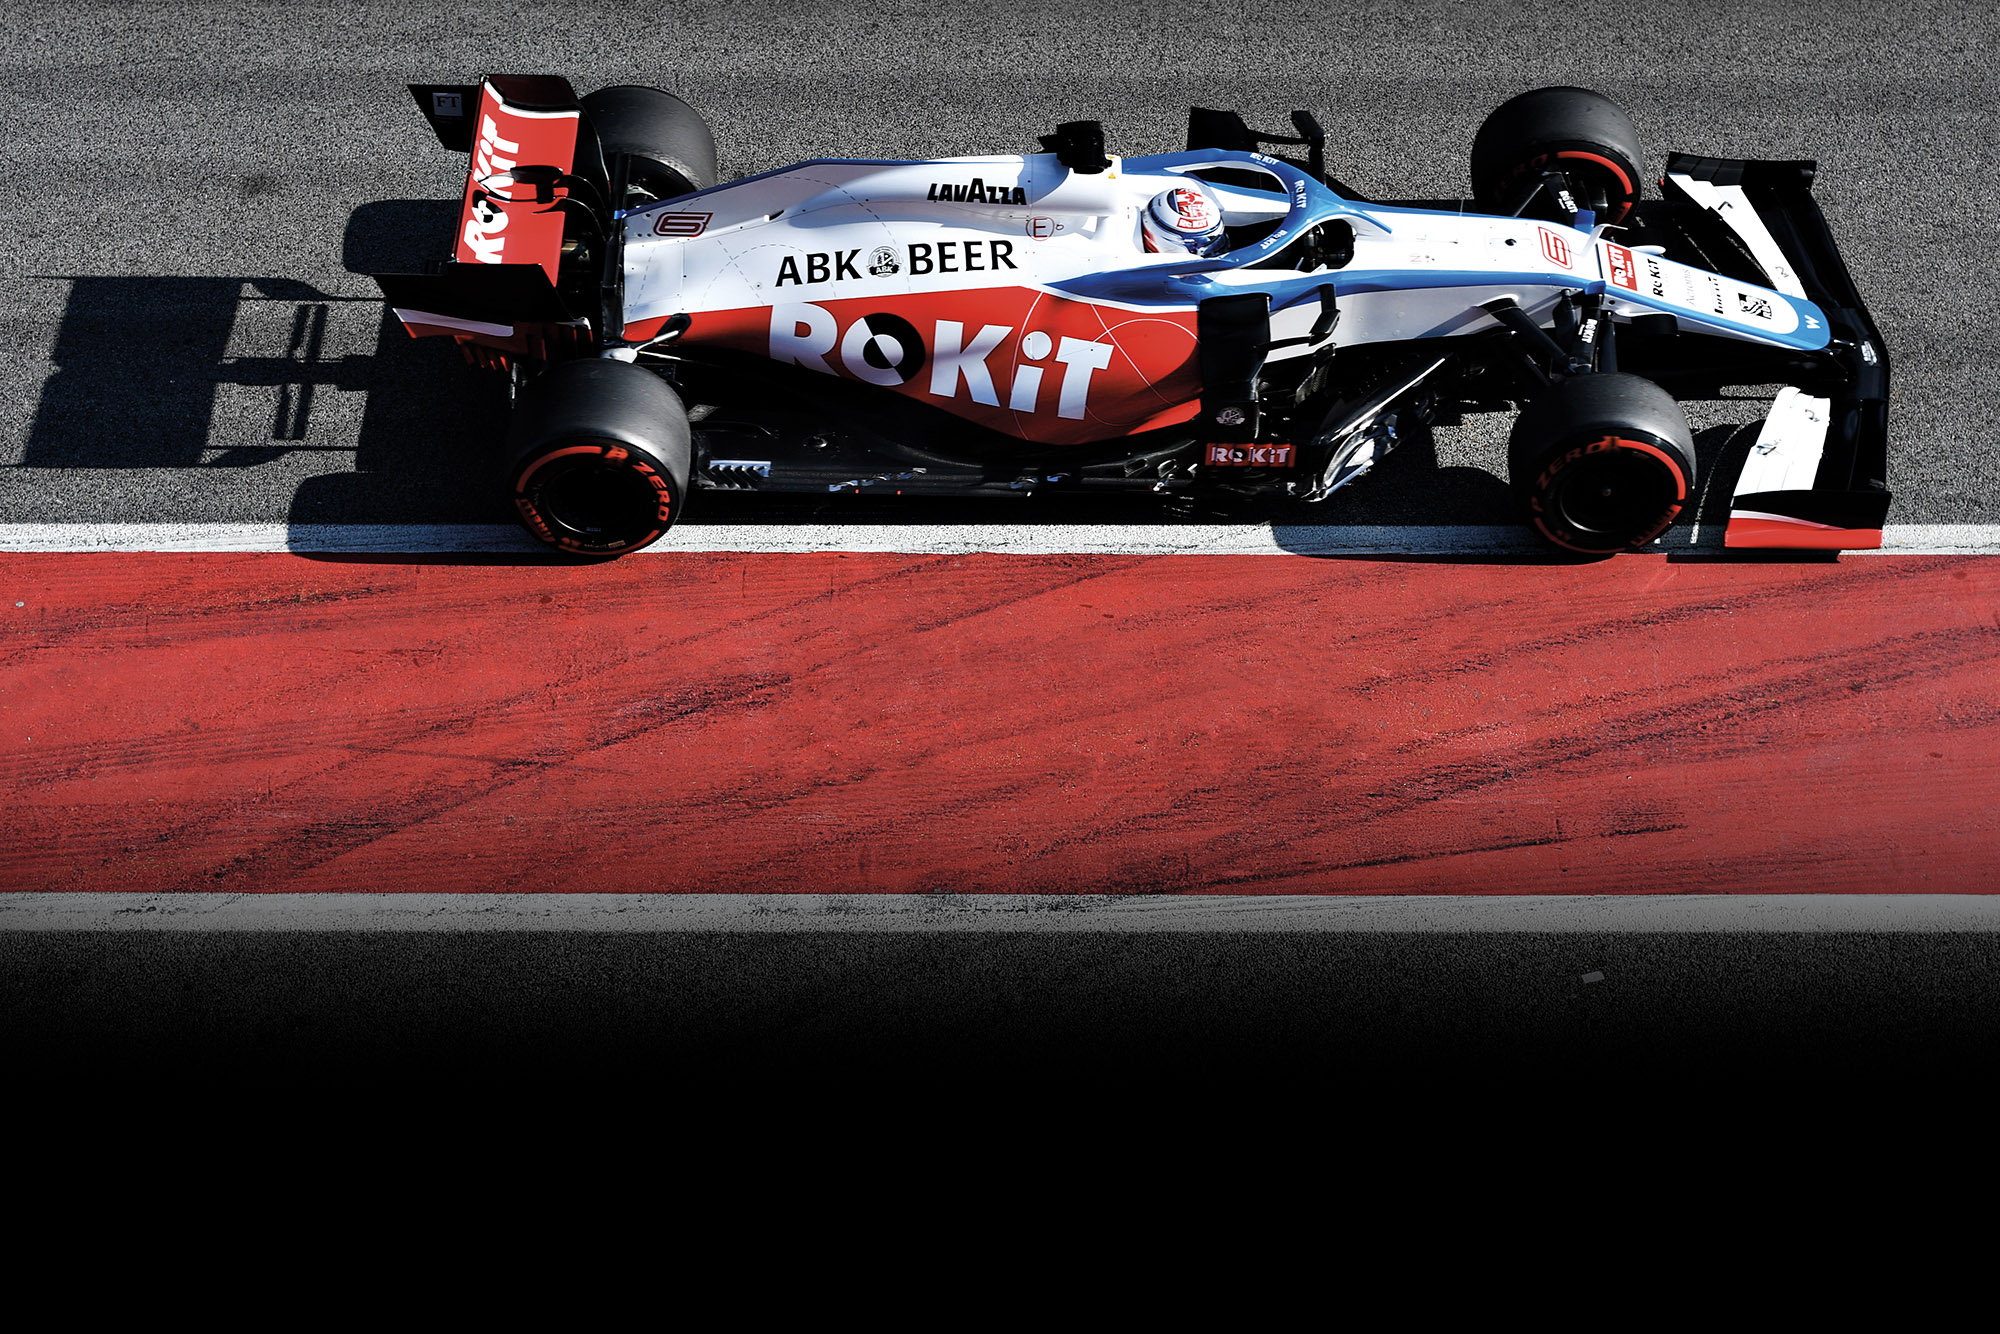 Nicholas Latifi drives the Williams FW43 at 2020 F1 preseason testing